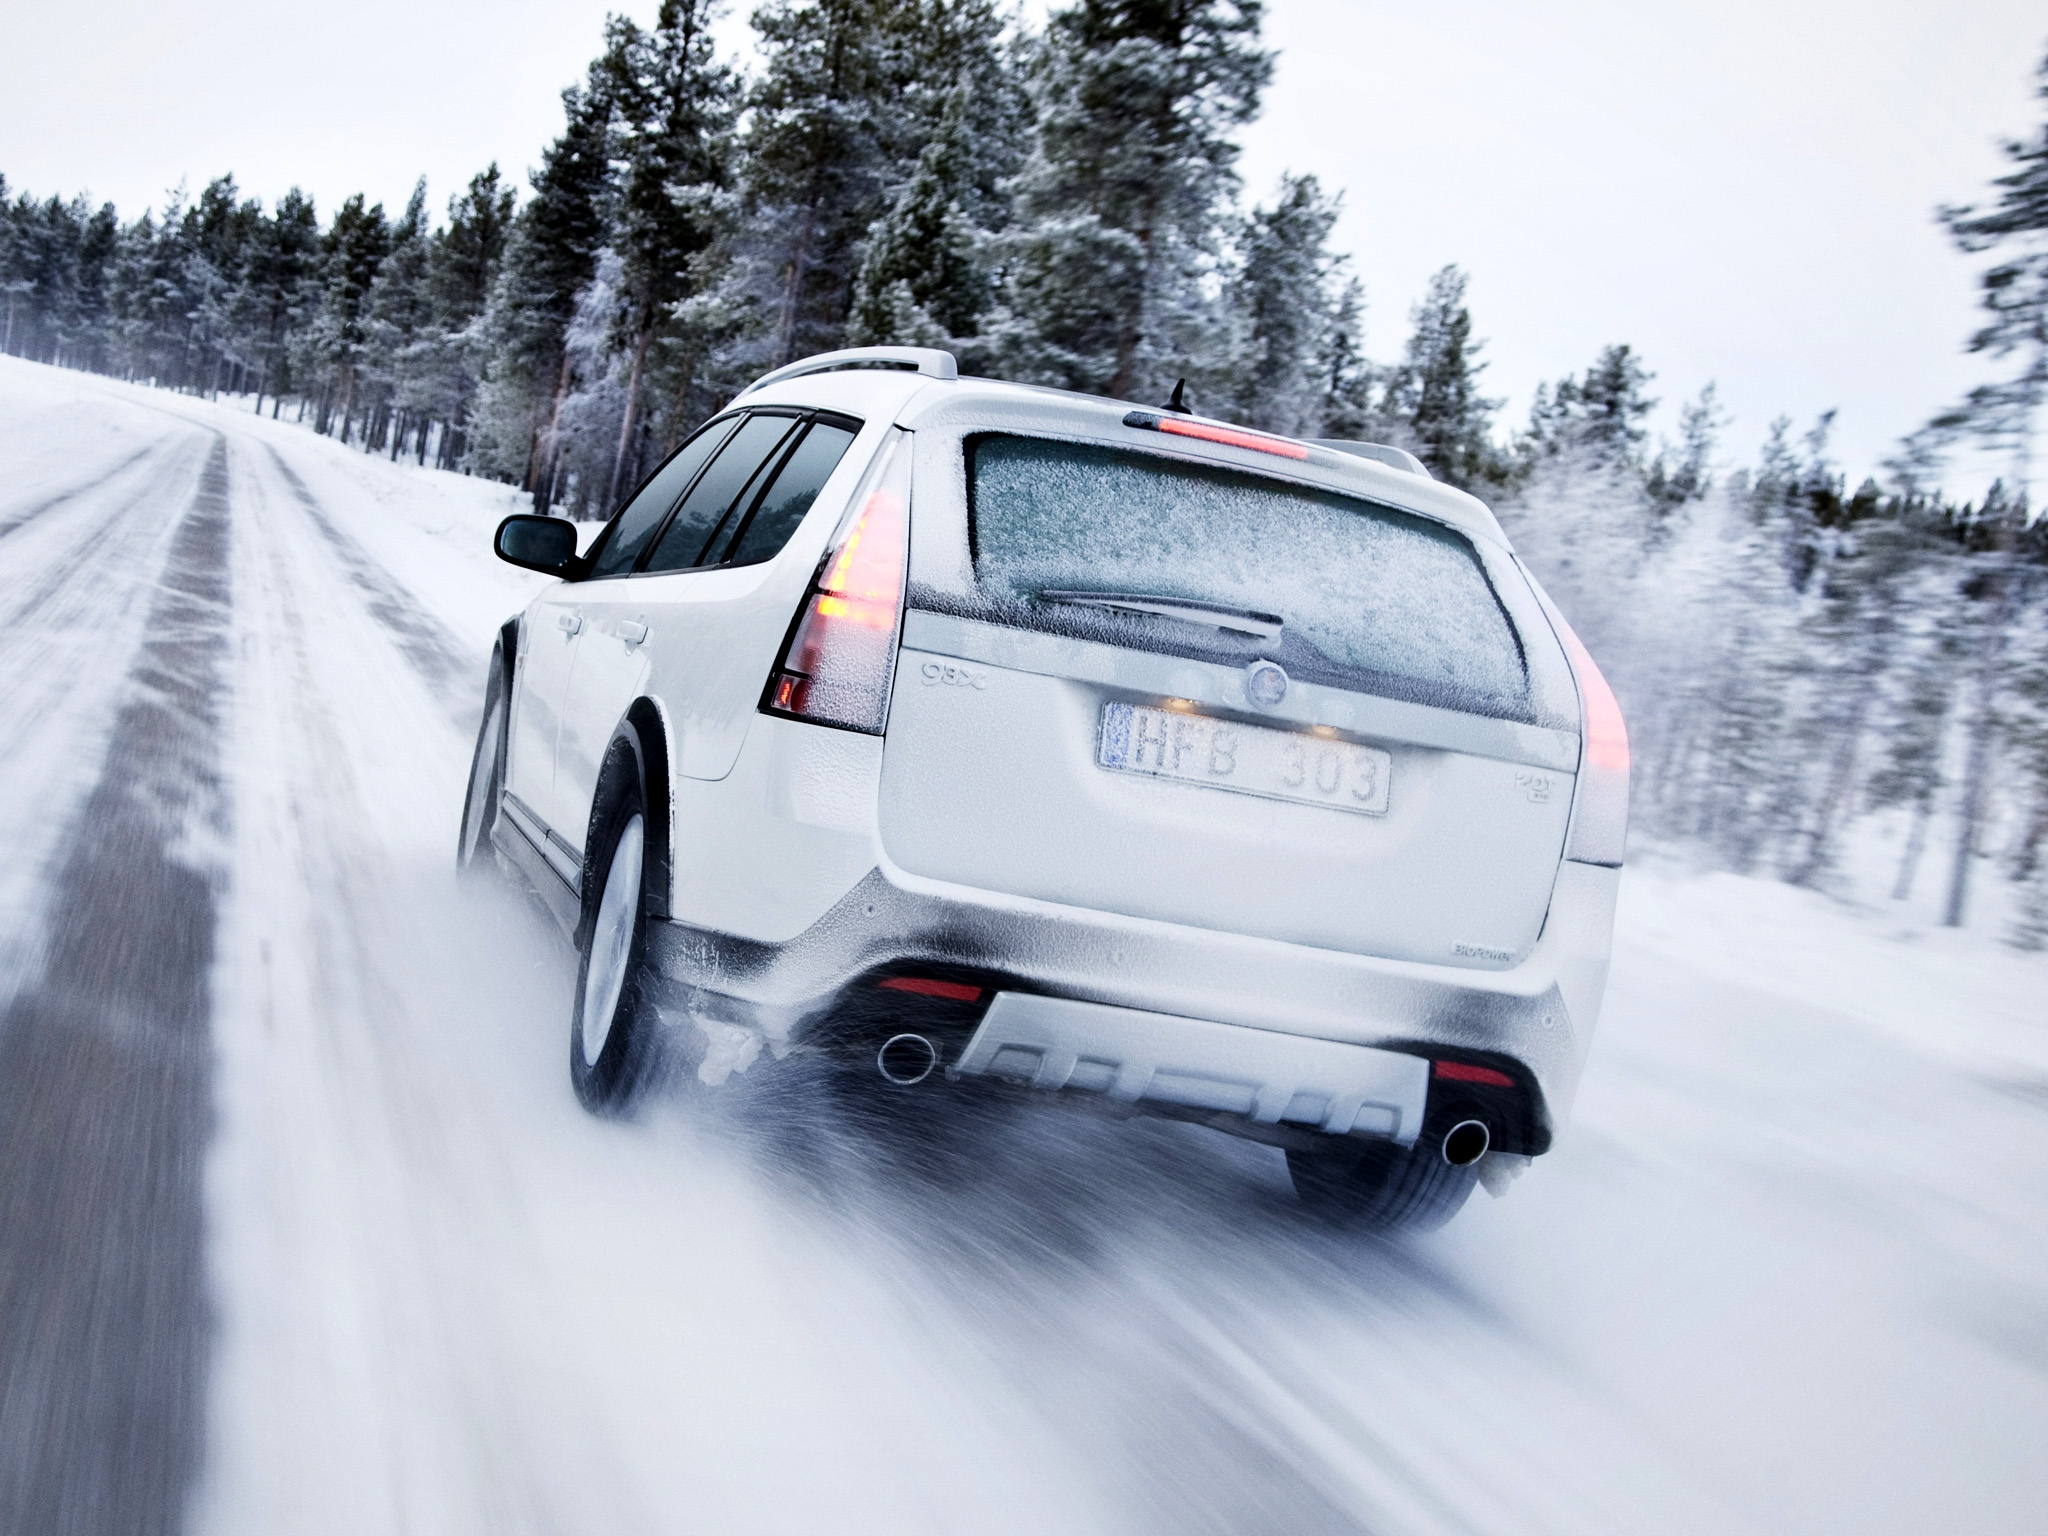 La Presse: Тест зимних шин размера 225/65 R17